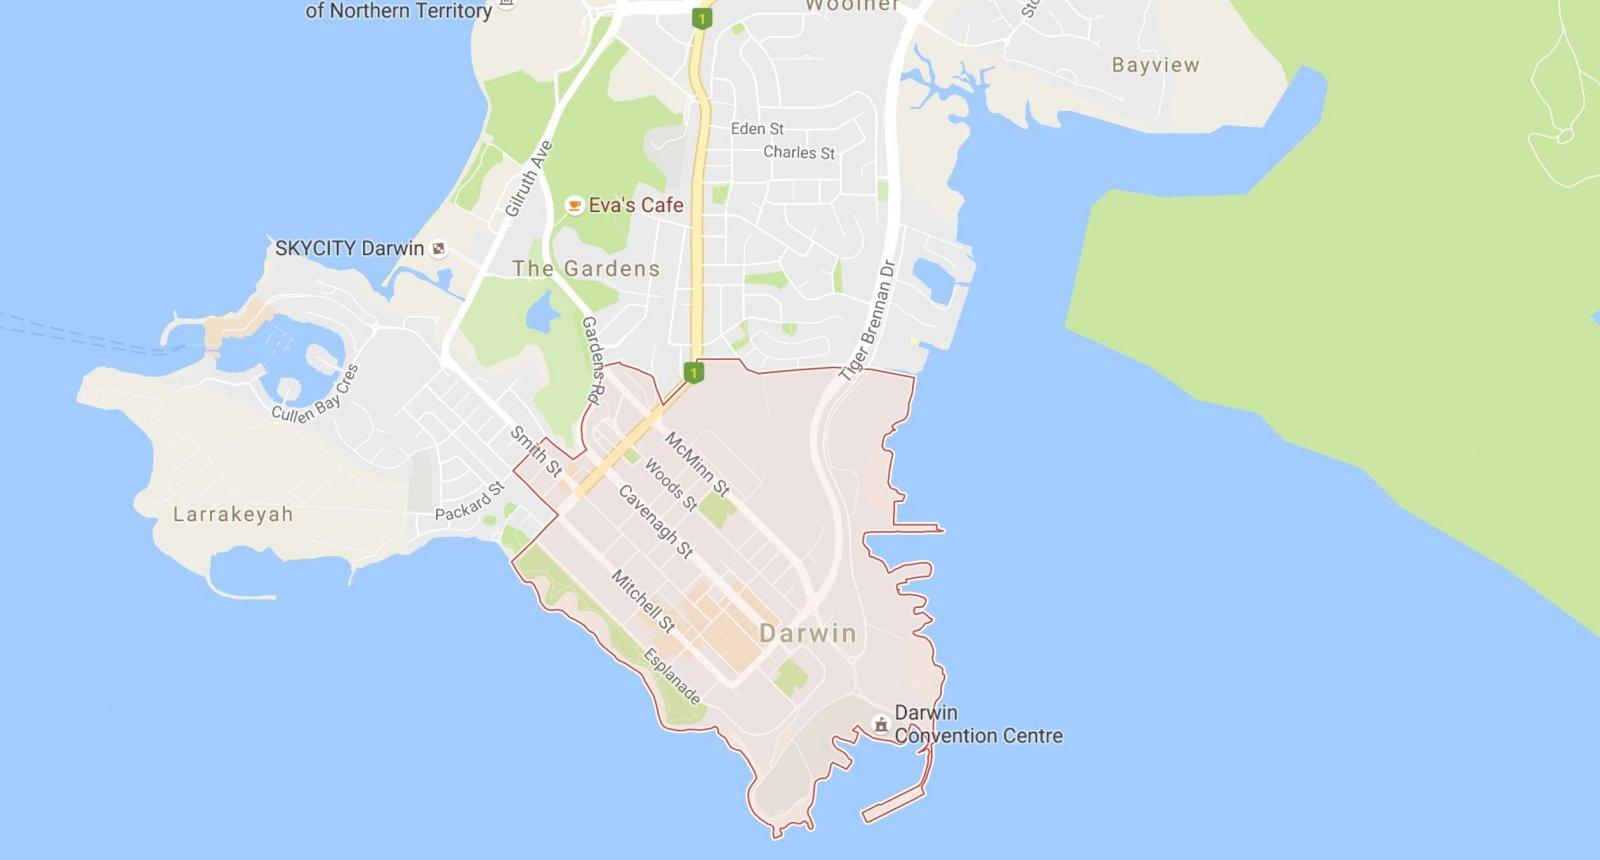 Darwins central business district